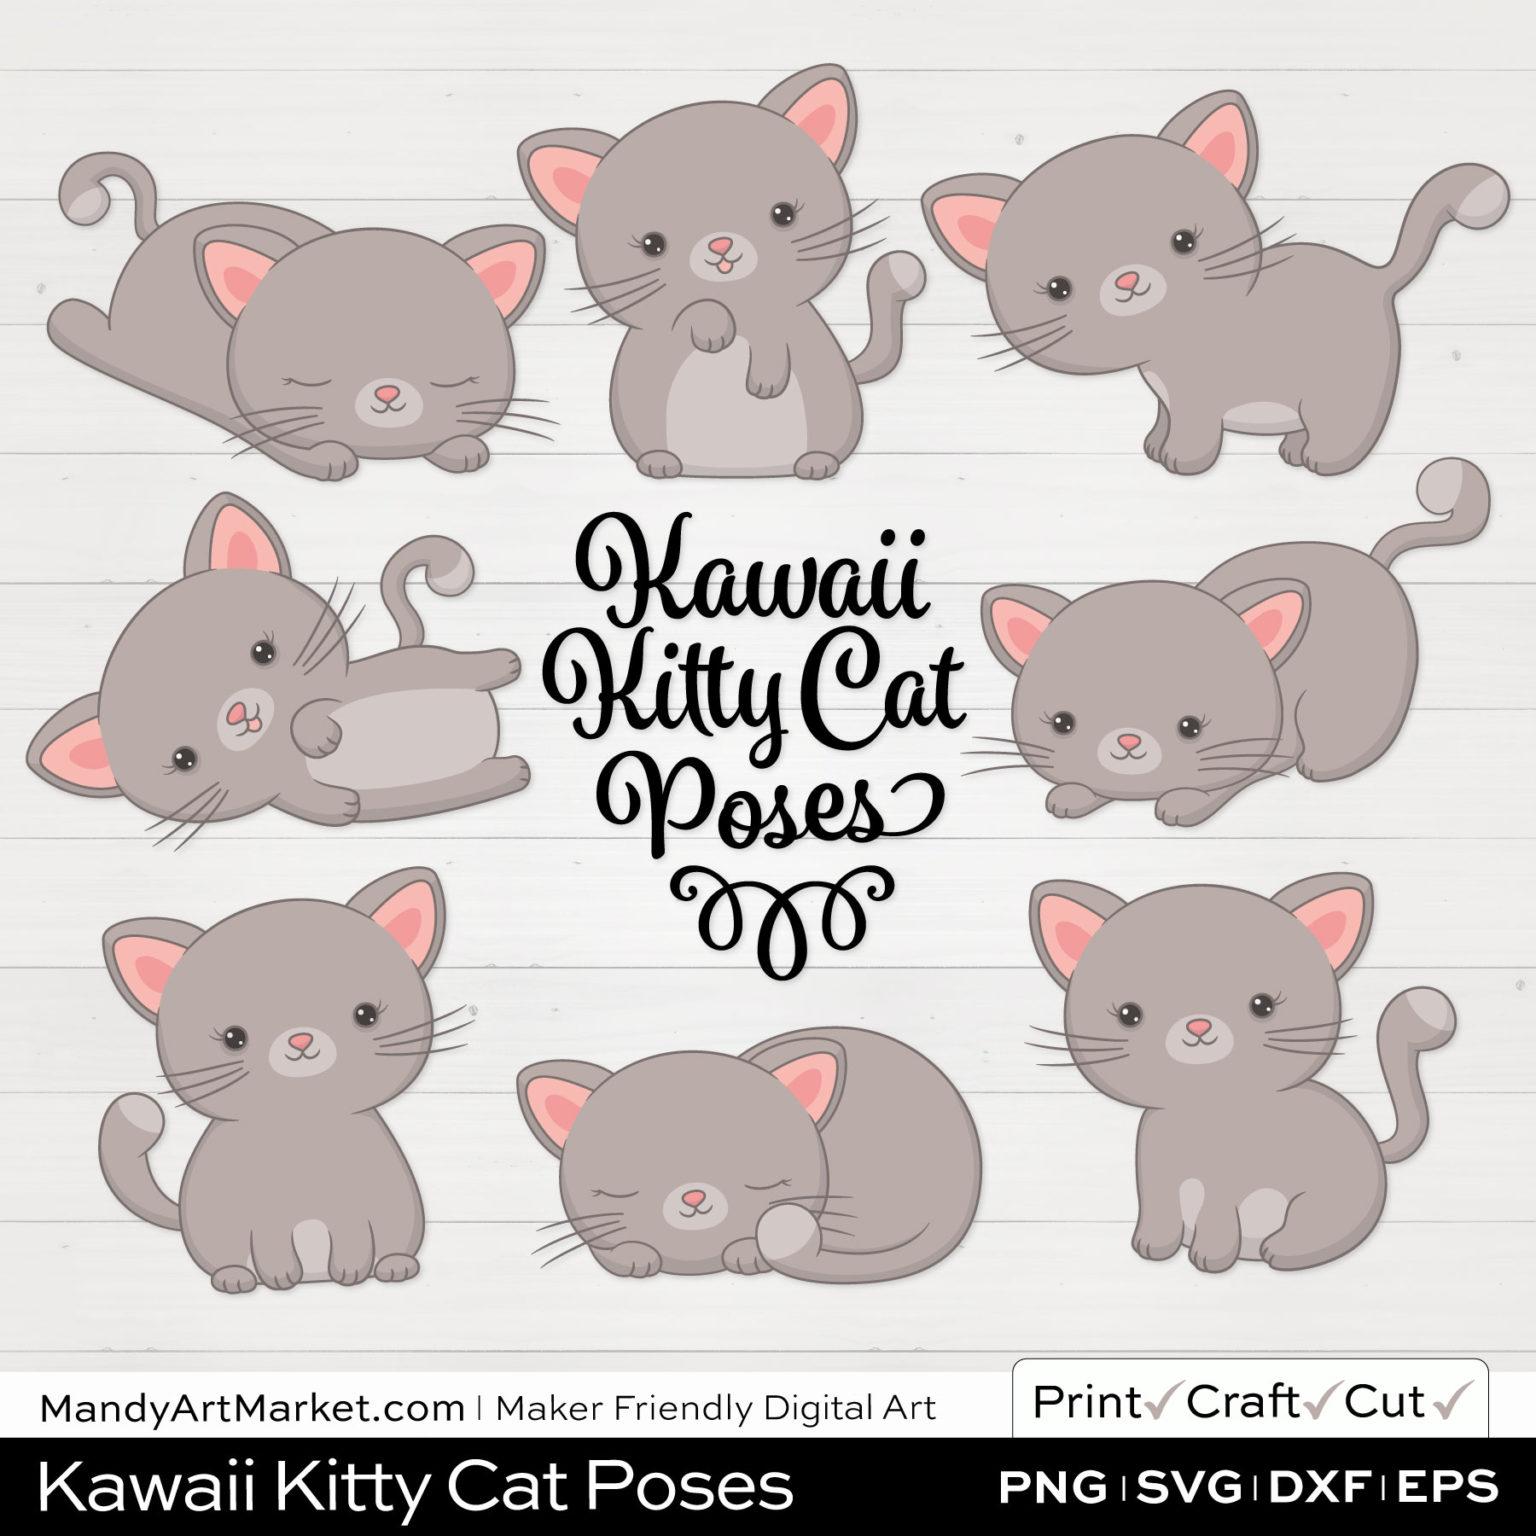 Light Fog Gray Kawaii Kitty Cat Poses Clipart on White Background